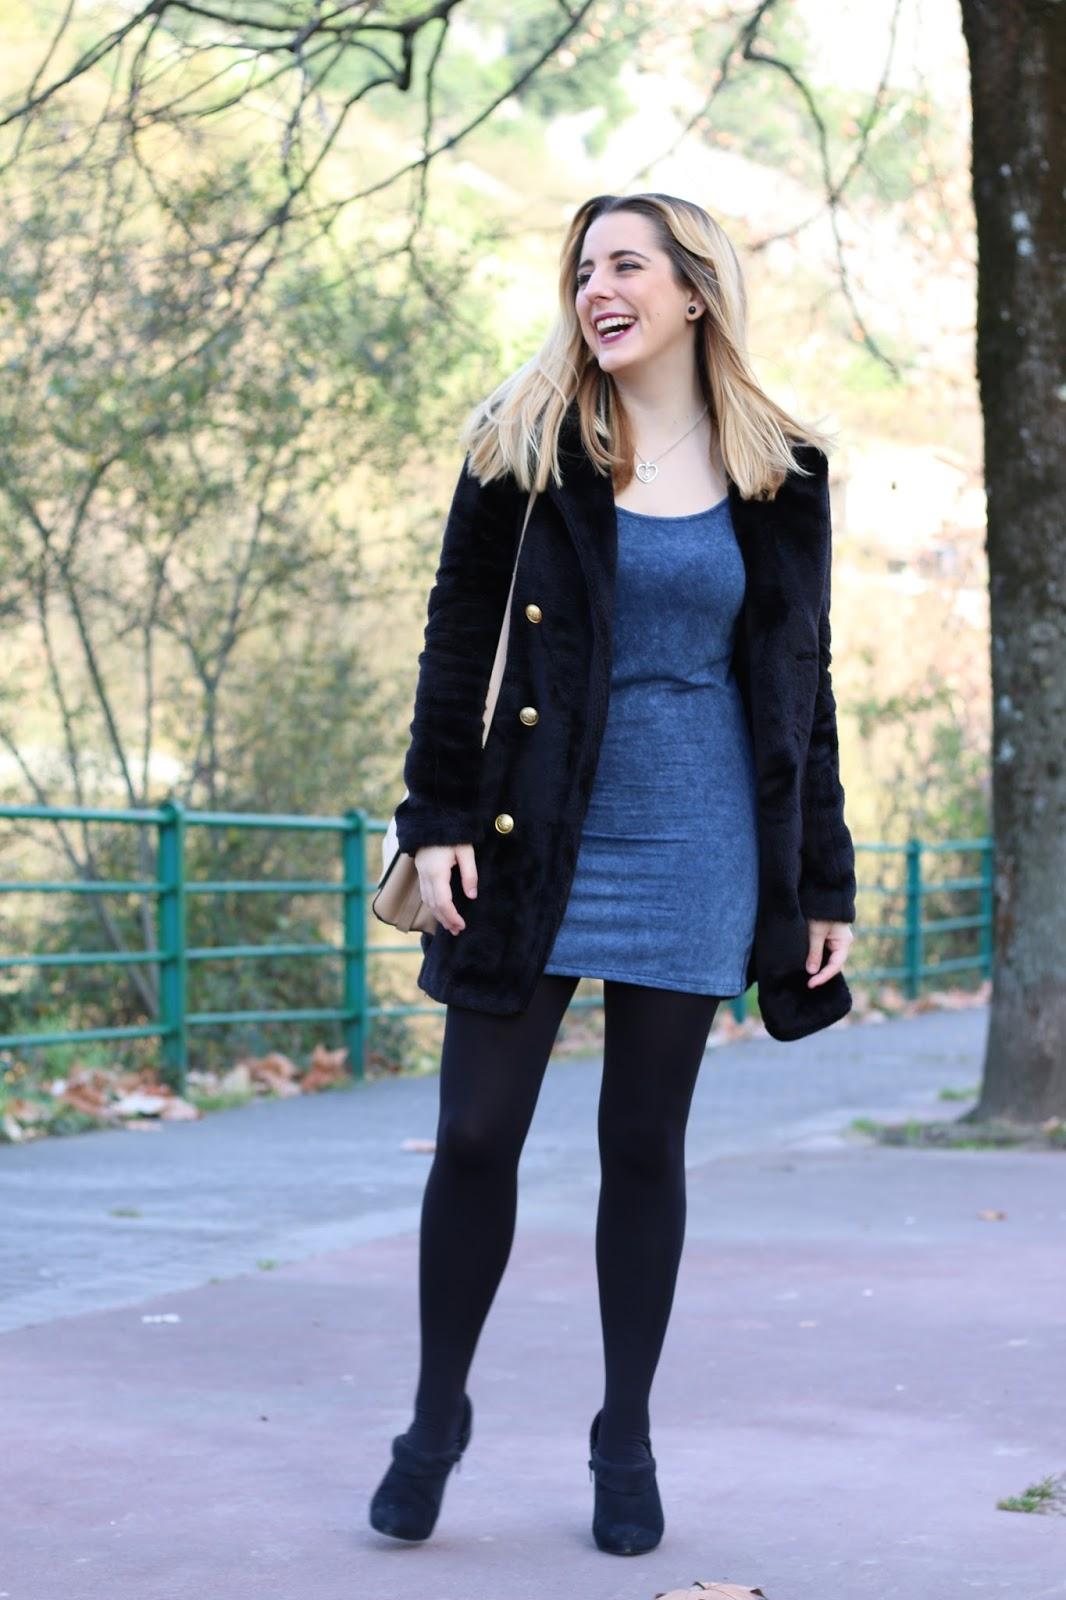 Vestido negro con botines azules